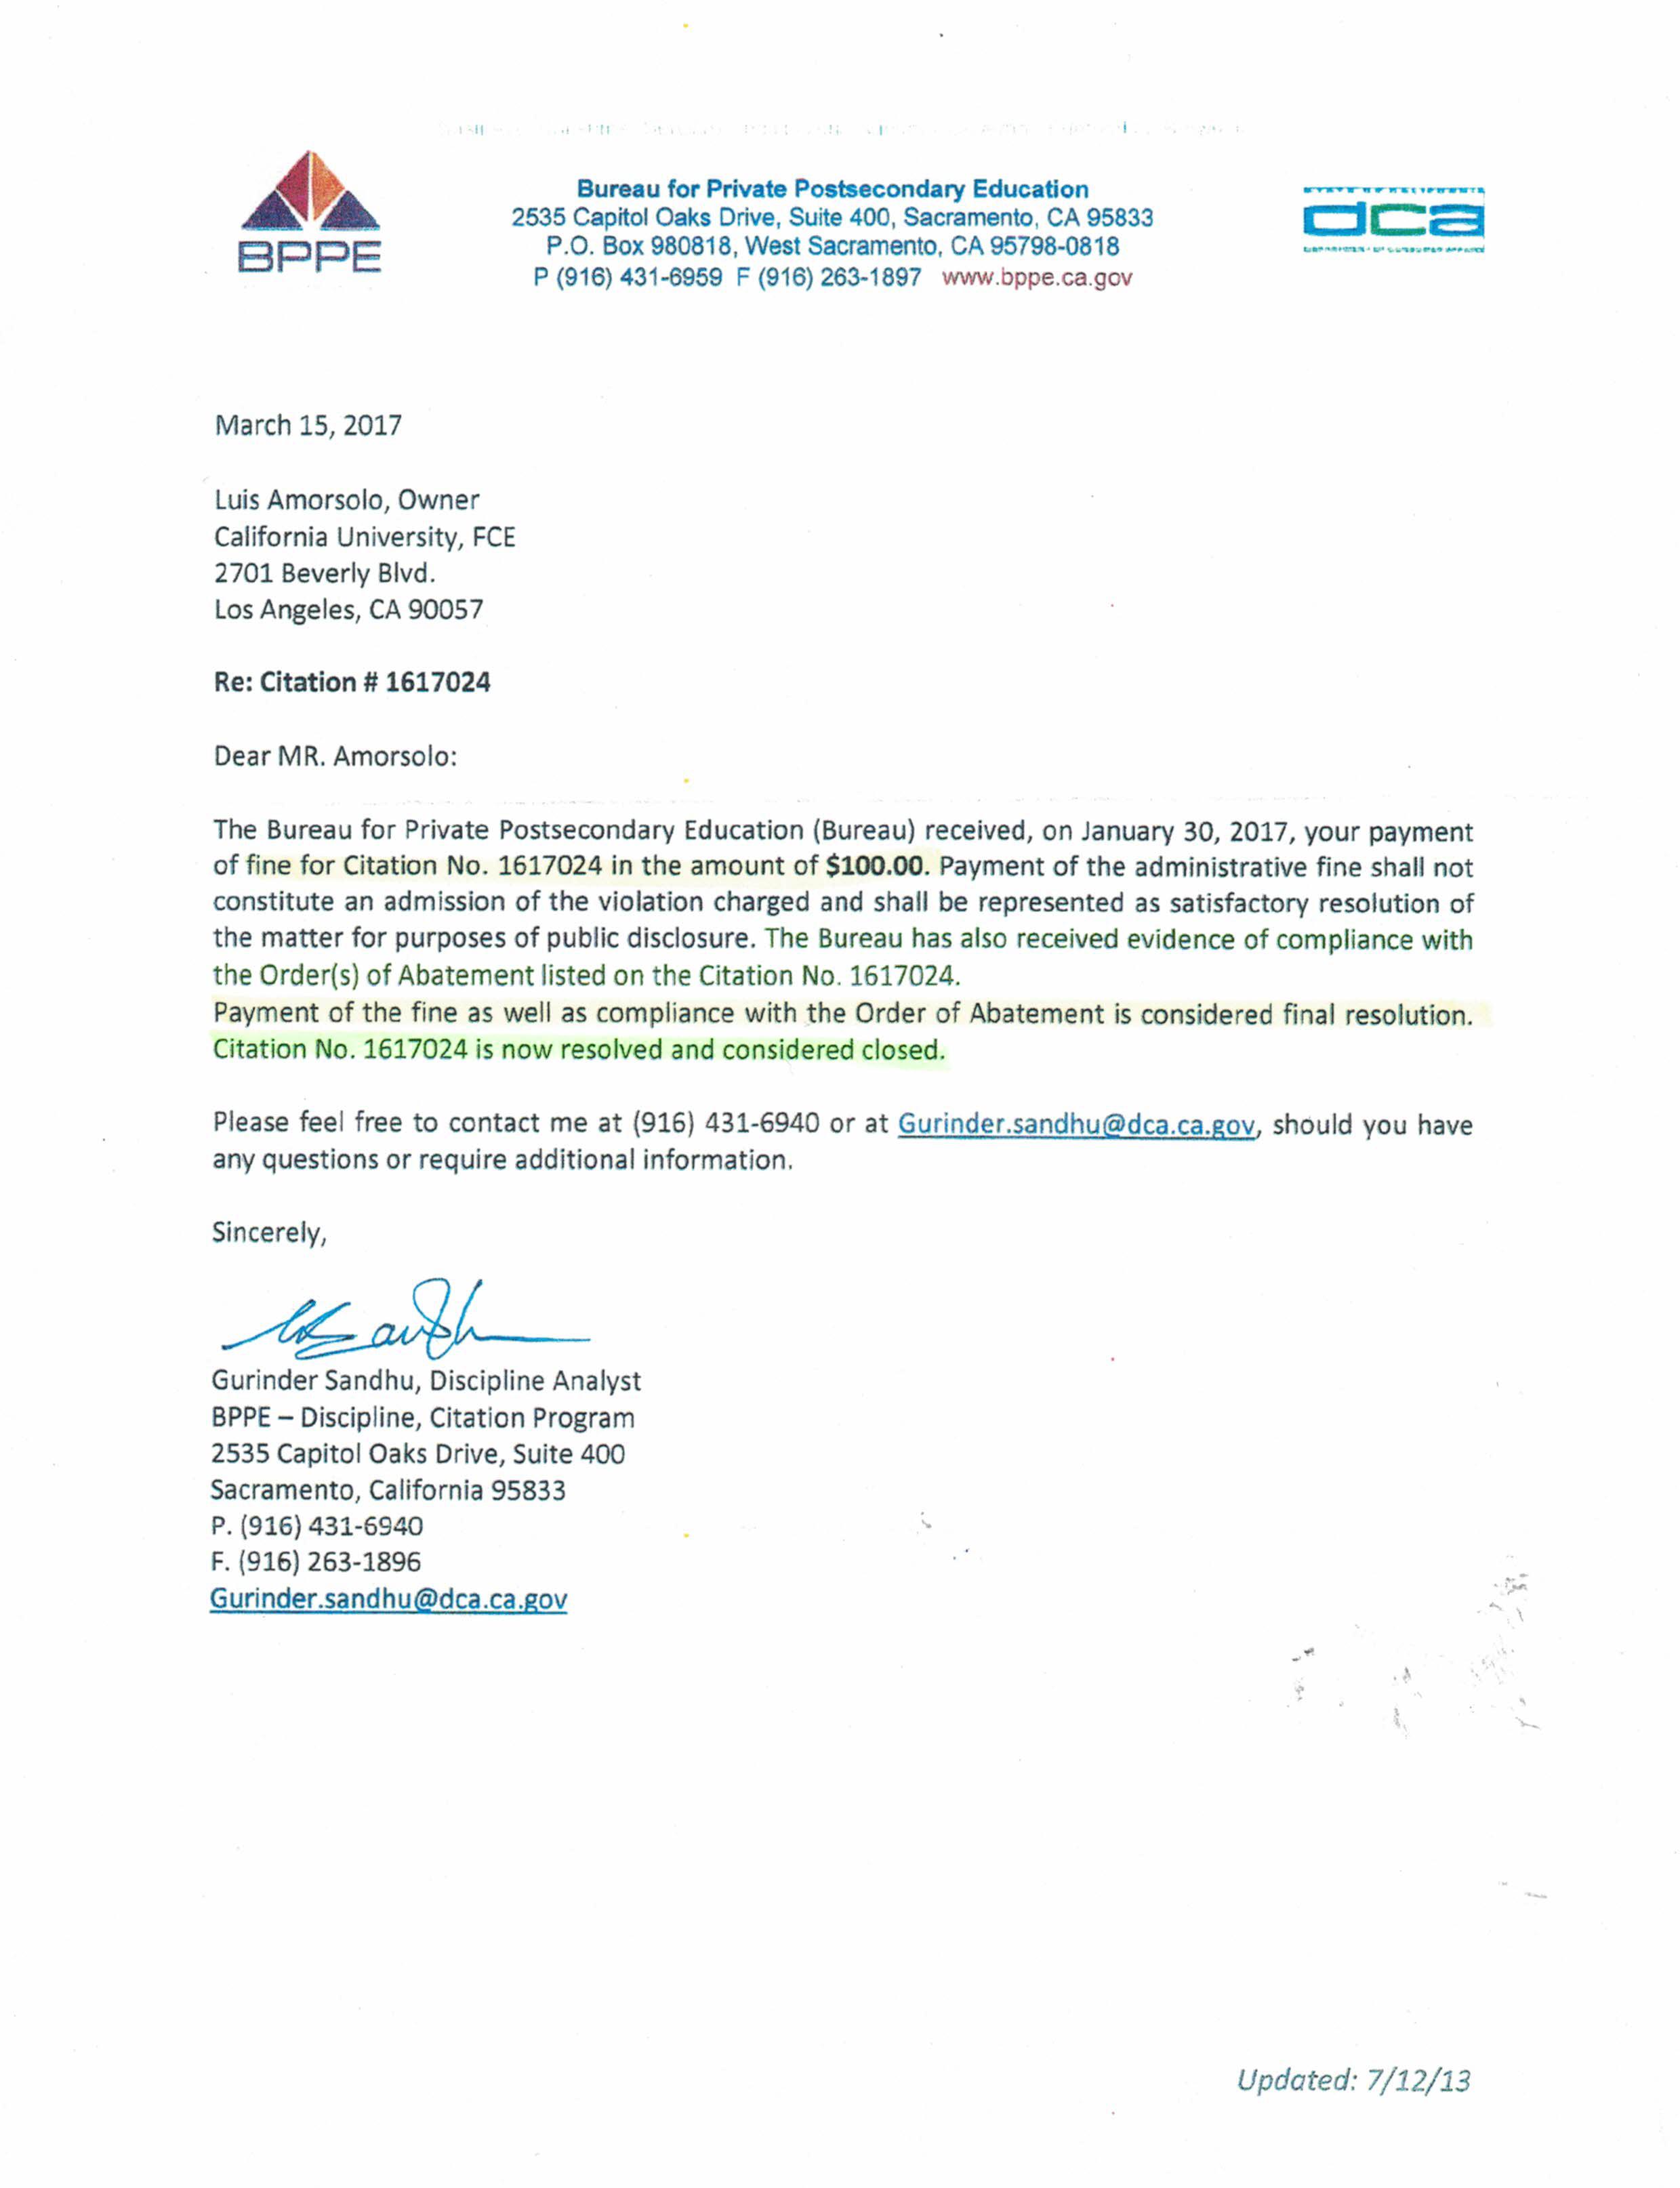 California university fce credential evaluation institution bppe decision re citation no 1617024 california department of education registration link cde california university fce yadclub Images